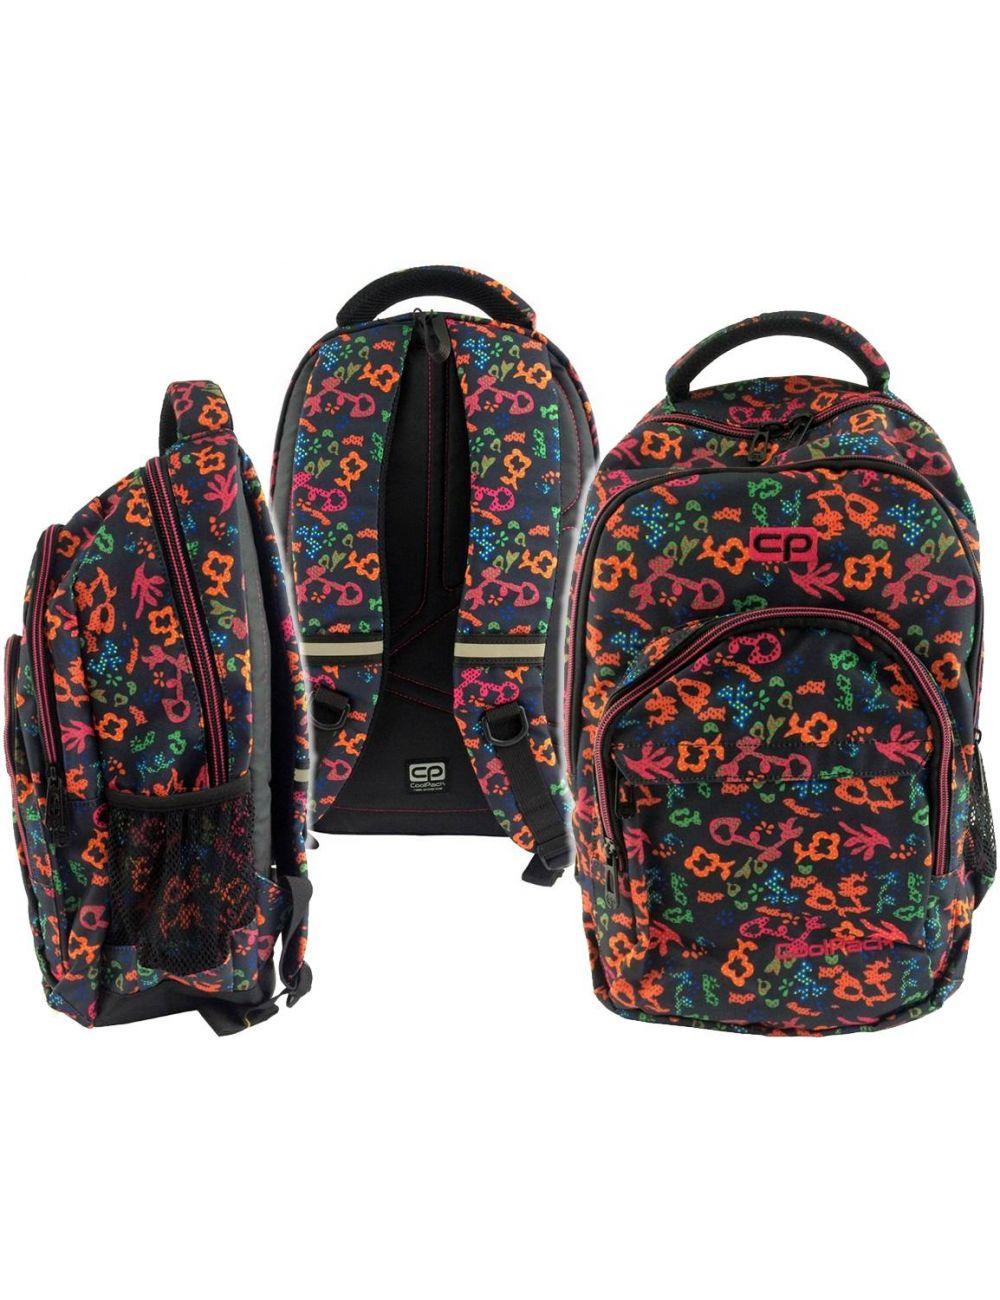 Plecak Szkolny Coolpack 27L Floral Dream 69489